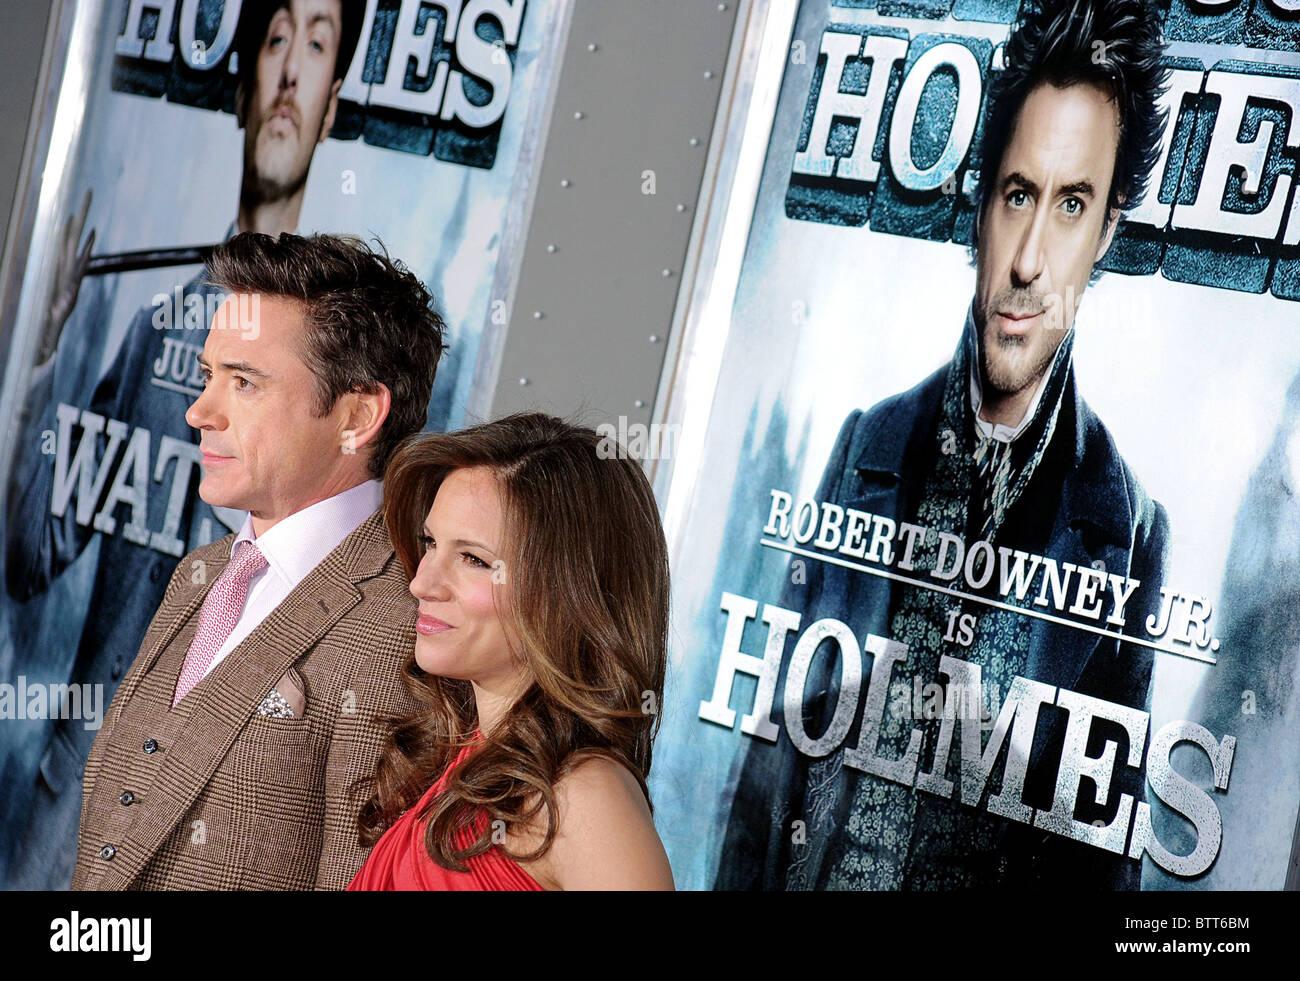 SHERLOCK HOLMES Premiere - Stock Image